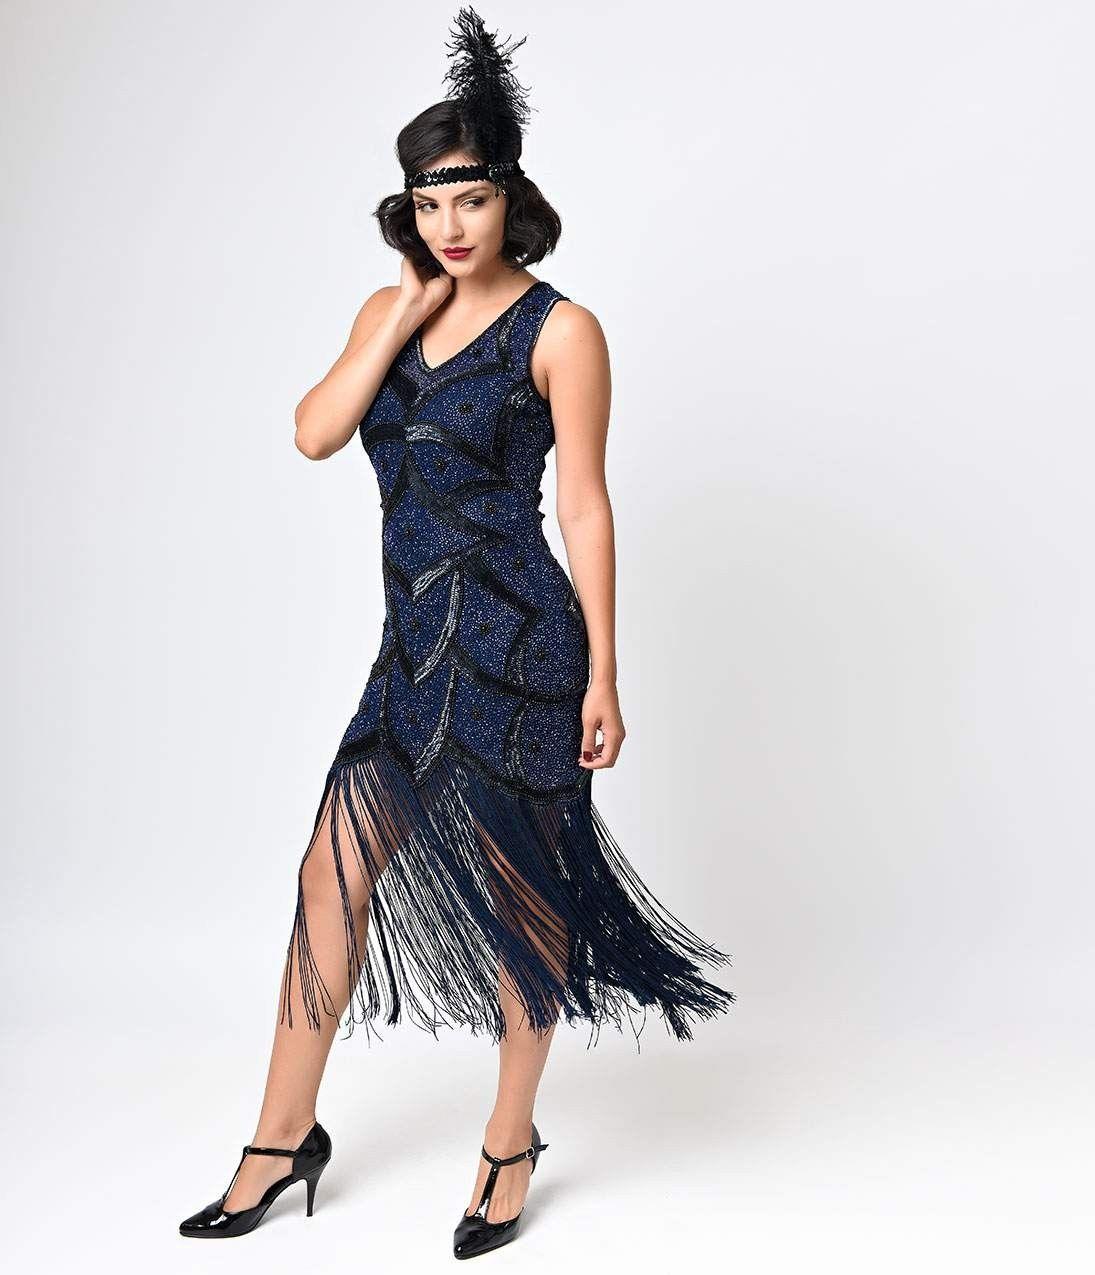 Iconic_by_UV_Black_Blue_Beaded_Mesh_Isadora_Fringe_Flapper_Dress_3.jpg (1095×1275)